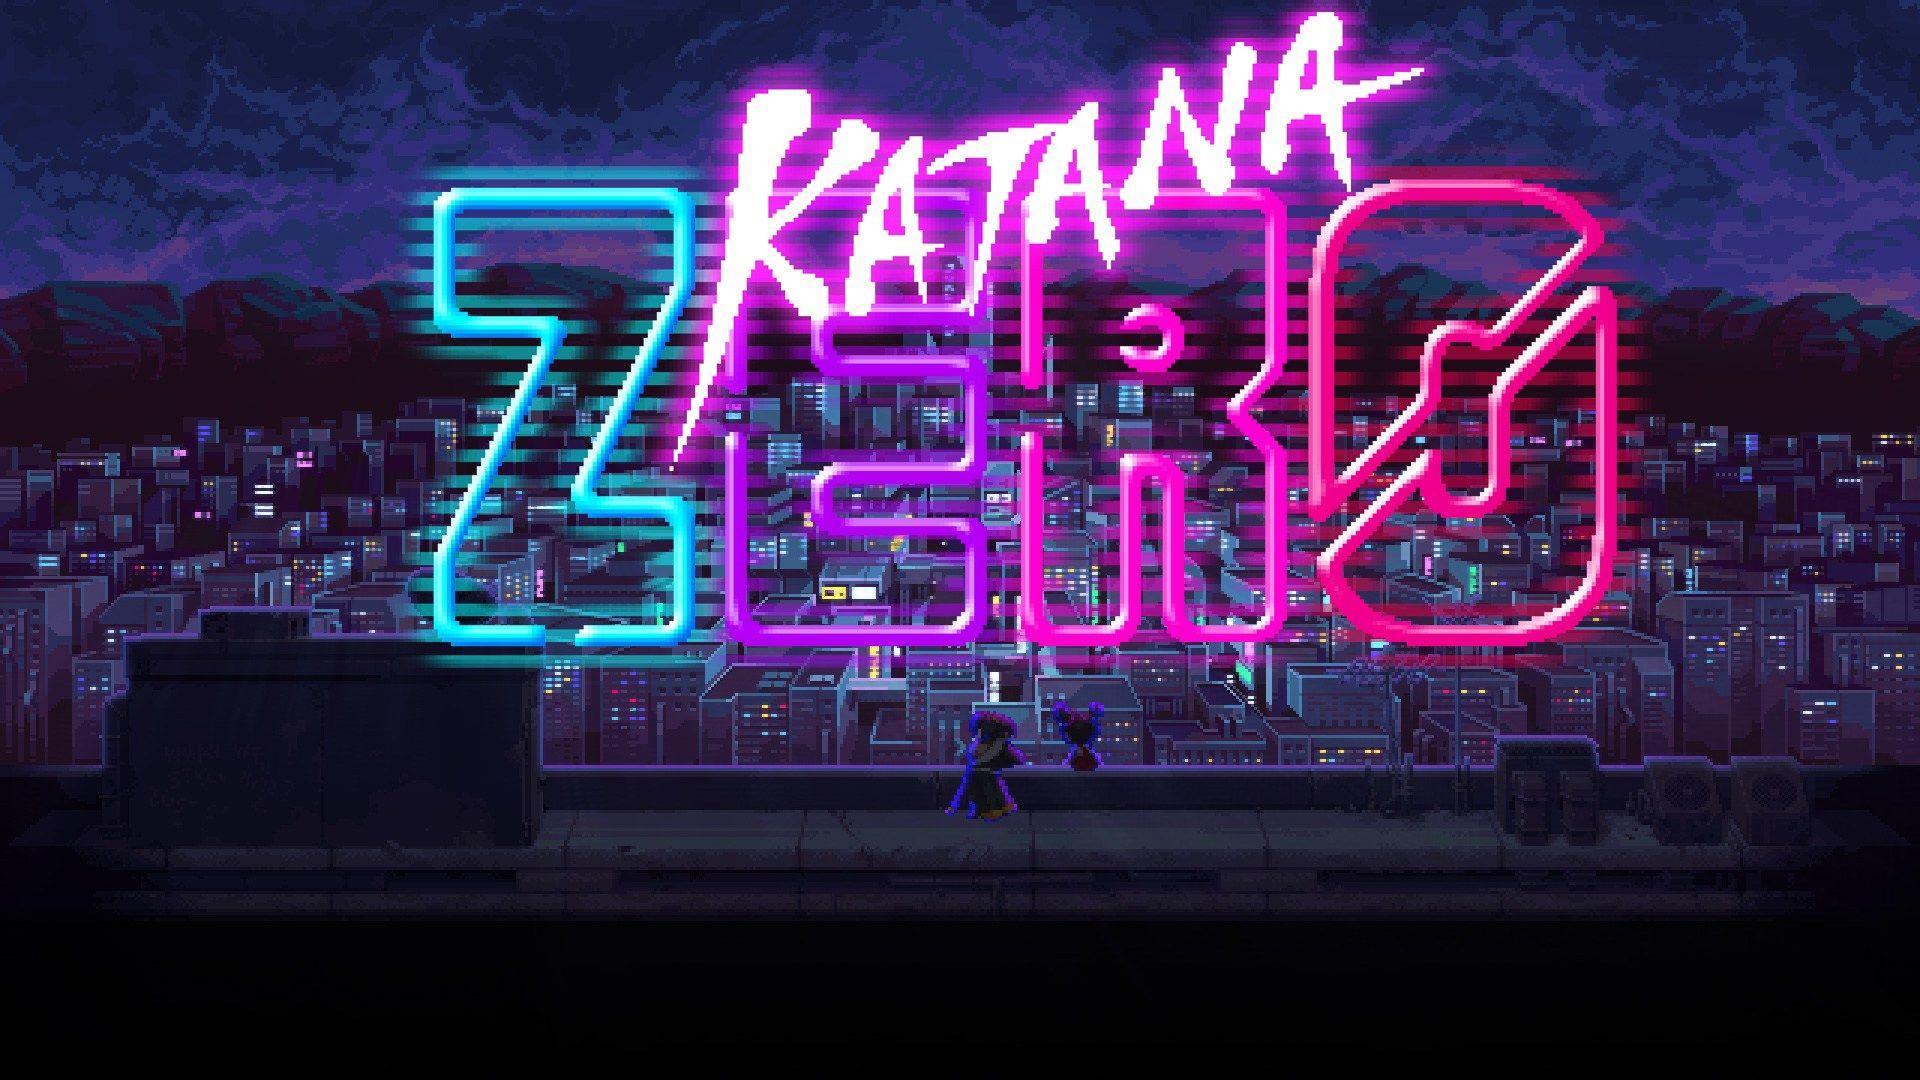 Katana Zero Wallpapers Top Free Katana Zero Backgrounds Wallpaperaccess